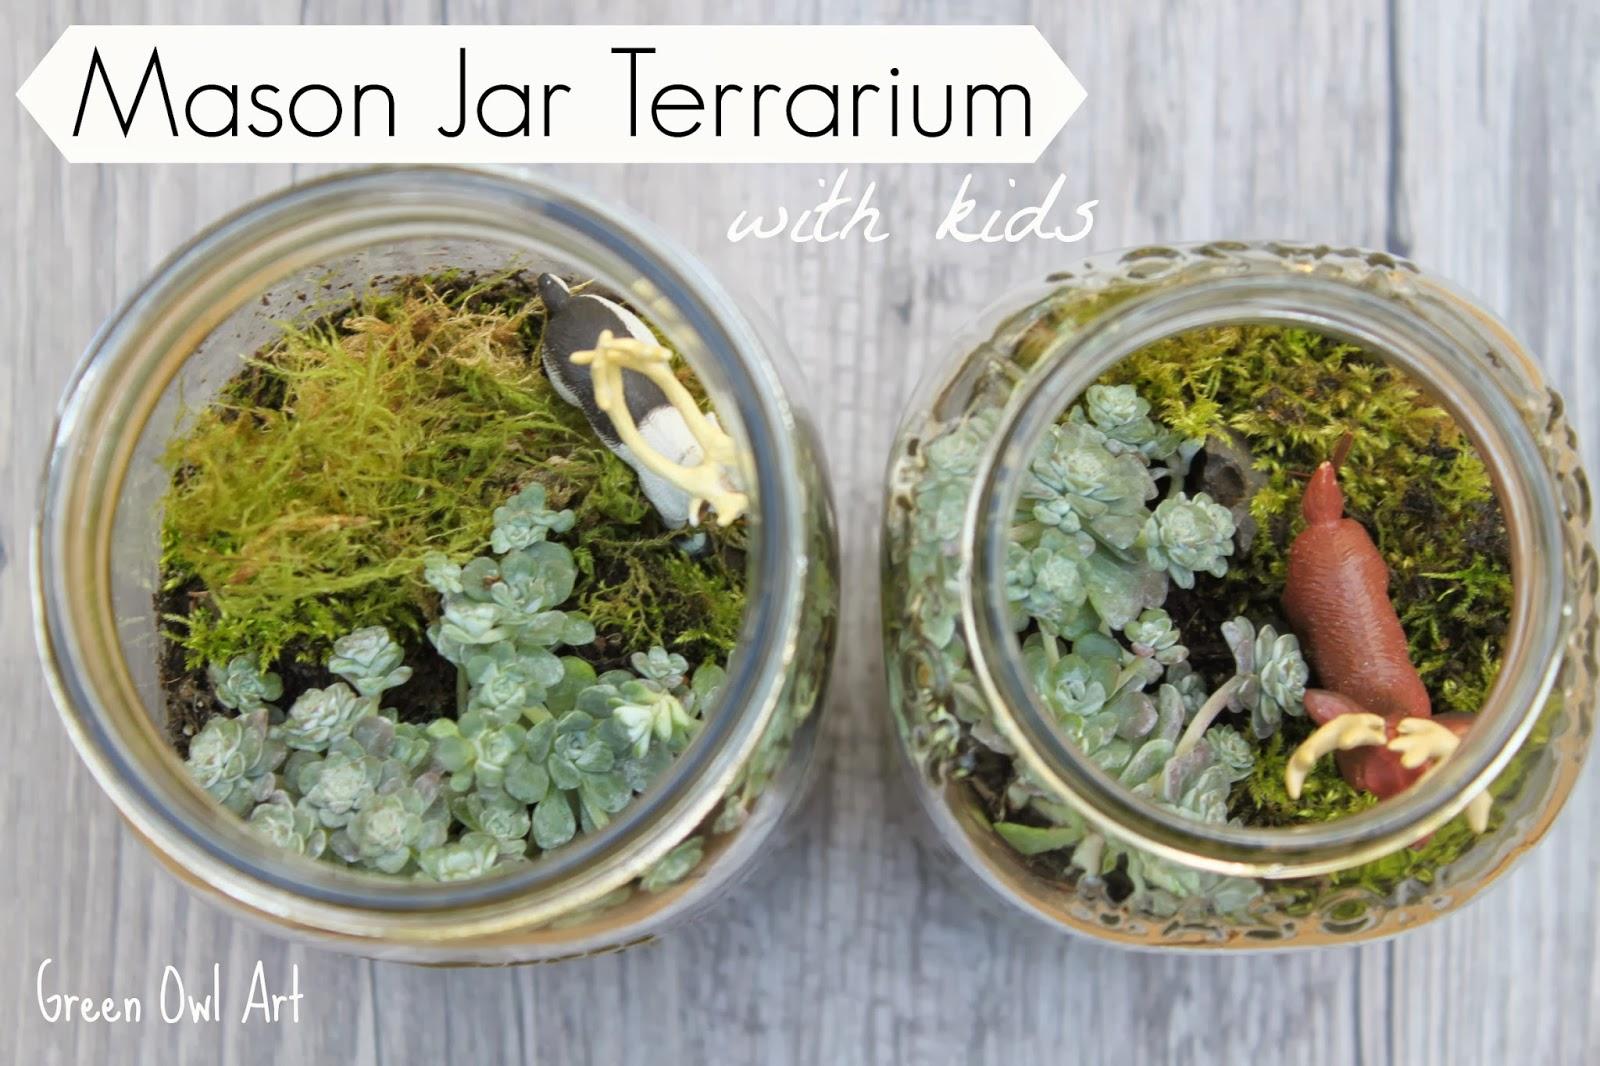 Green Owl Art Mason Jar Terrarium